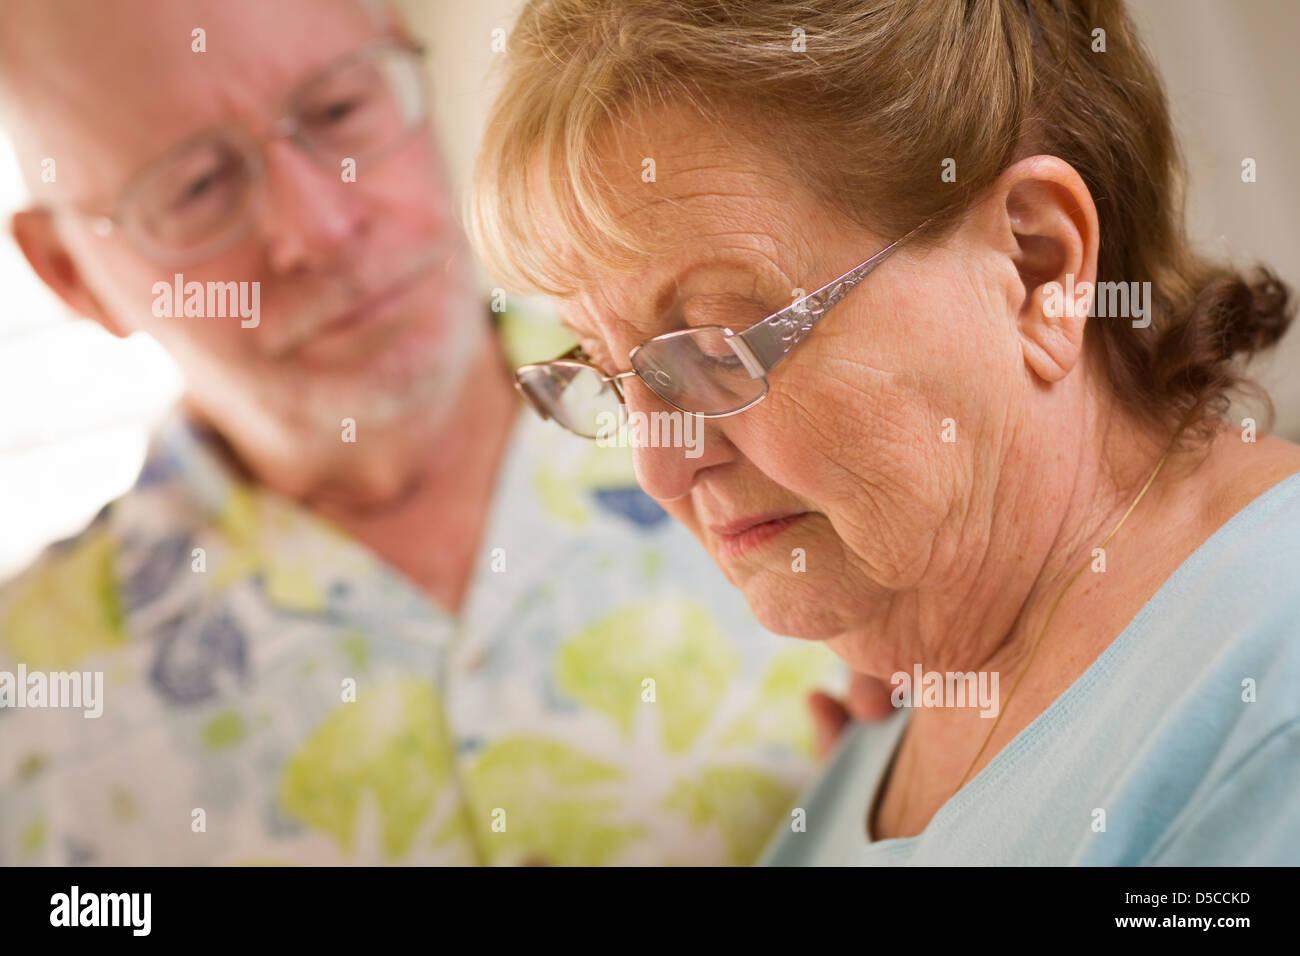 Hombre adulto Senior consolas superiores triste hembras adultas. Imagen De Stock